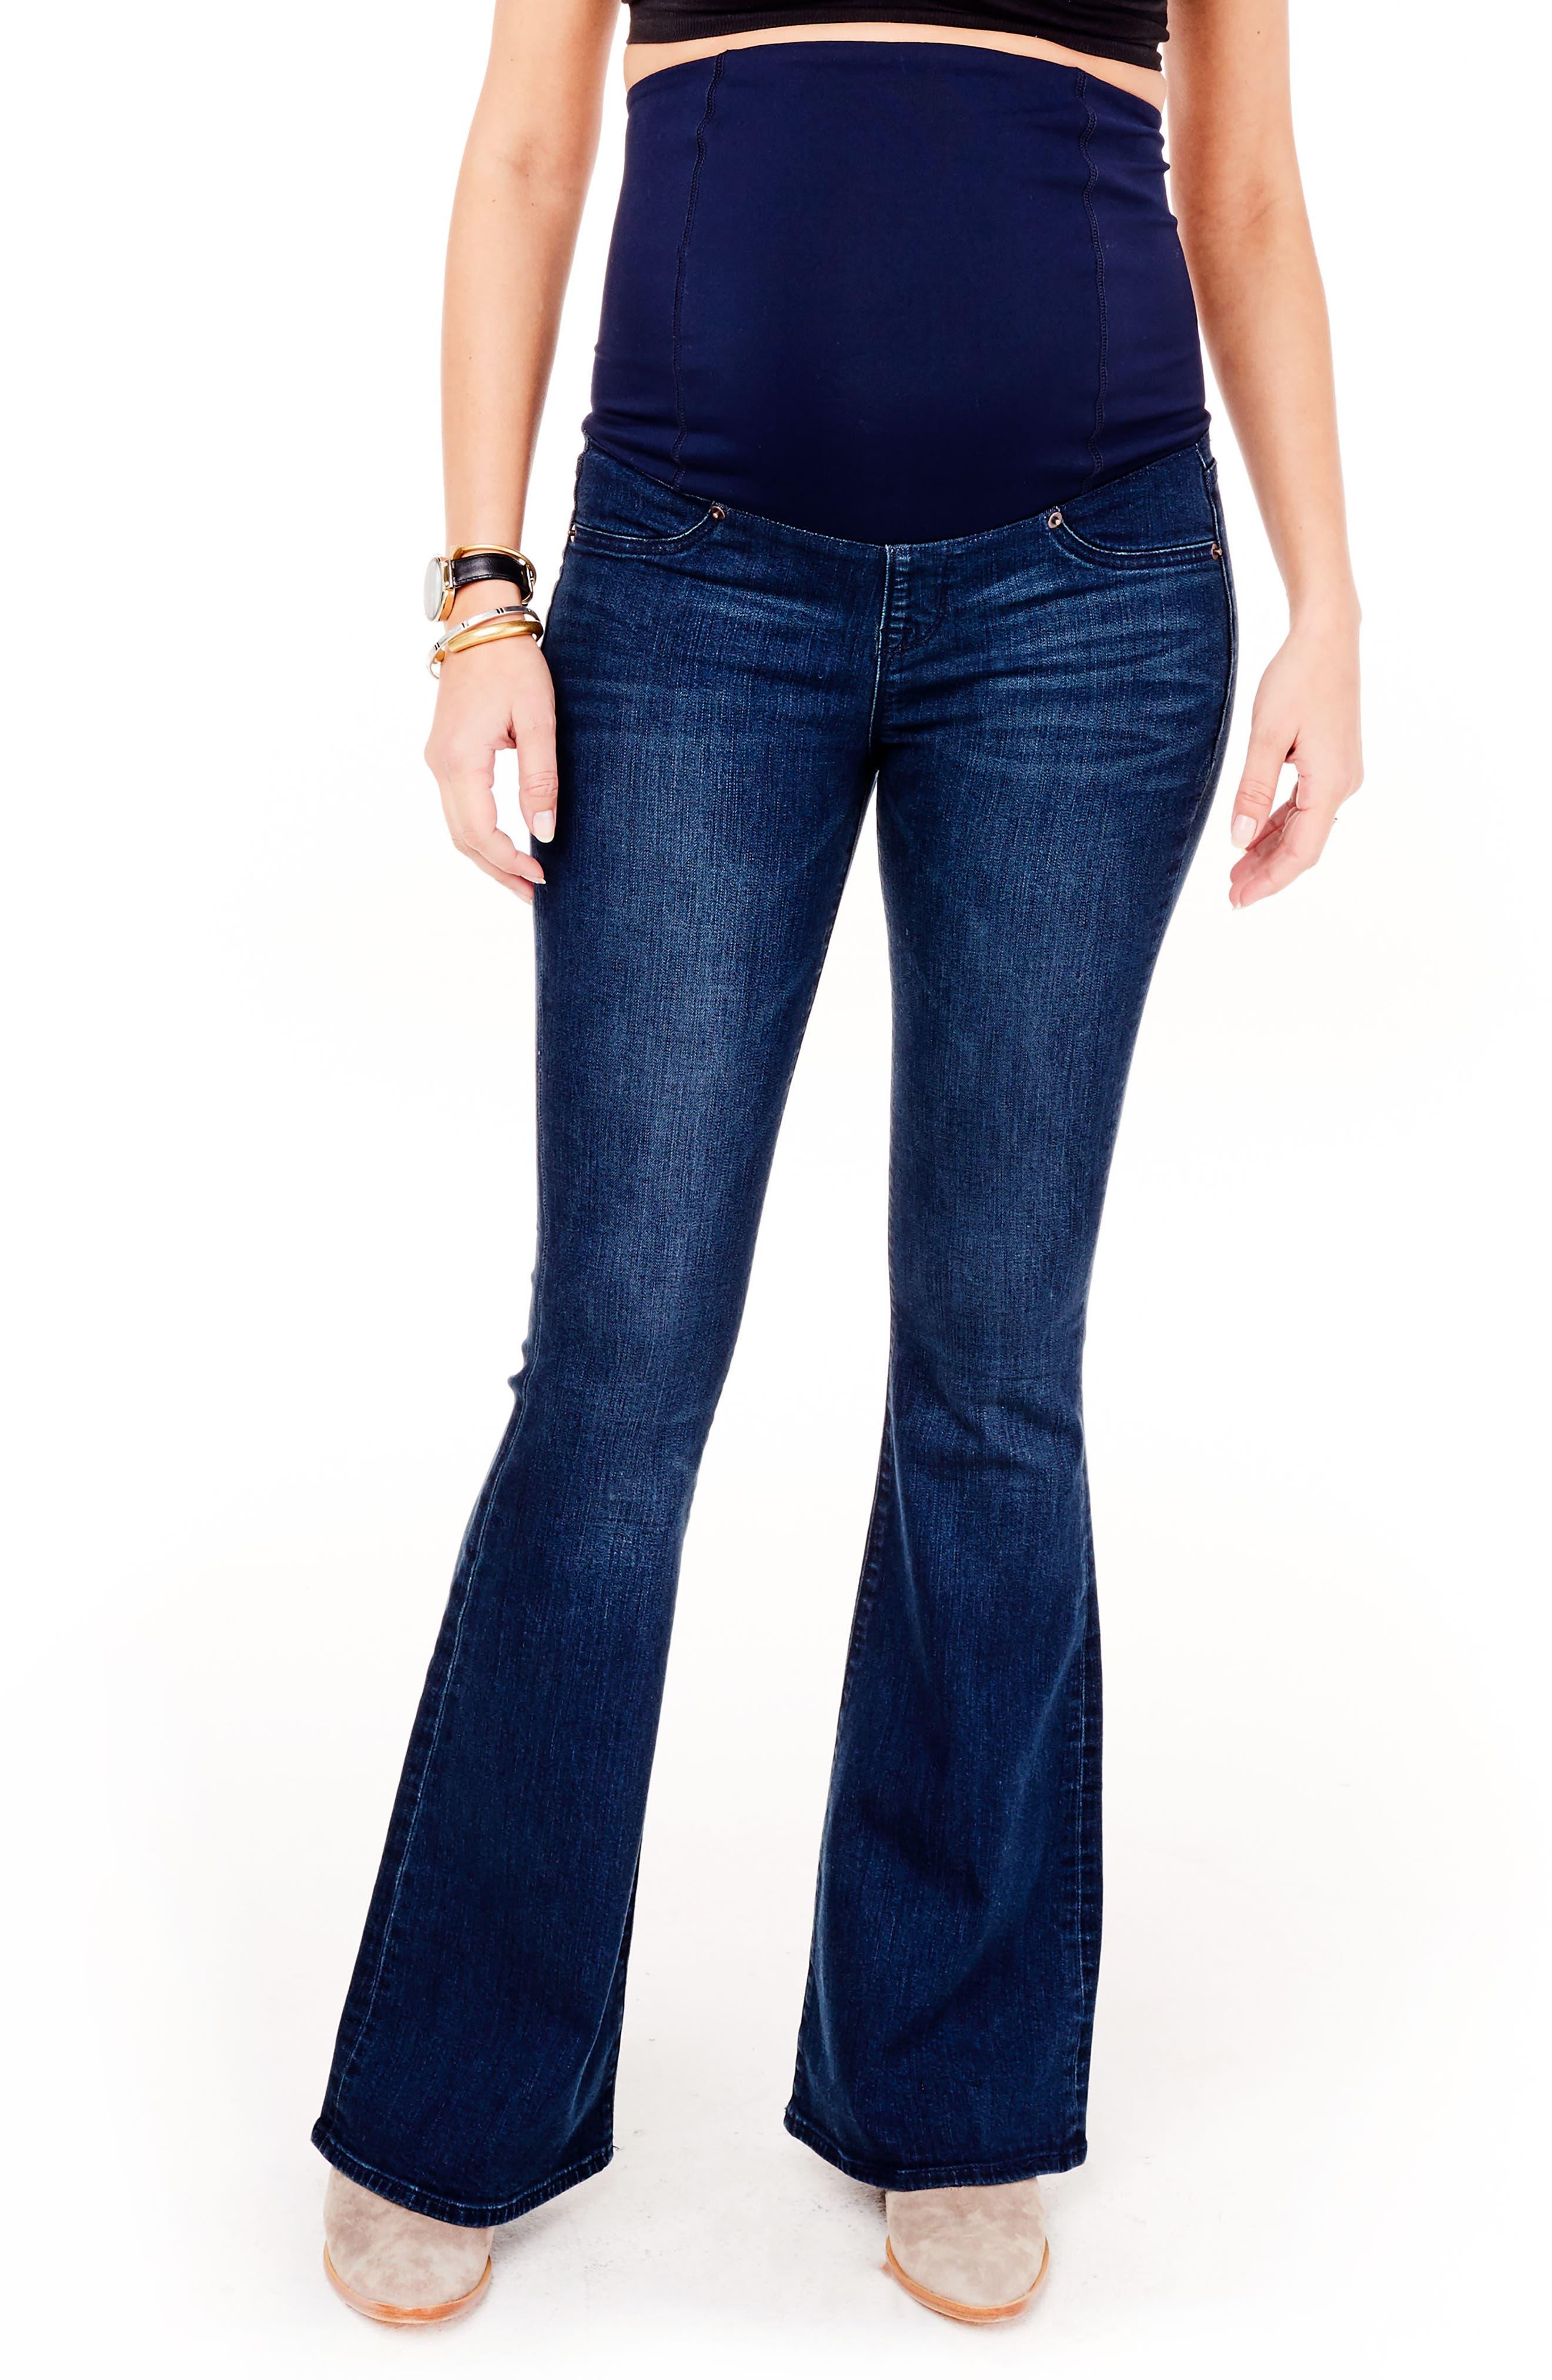 Ingrid & Isabel® Gracie Flare Maternity Jeans (True Blue)